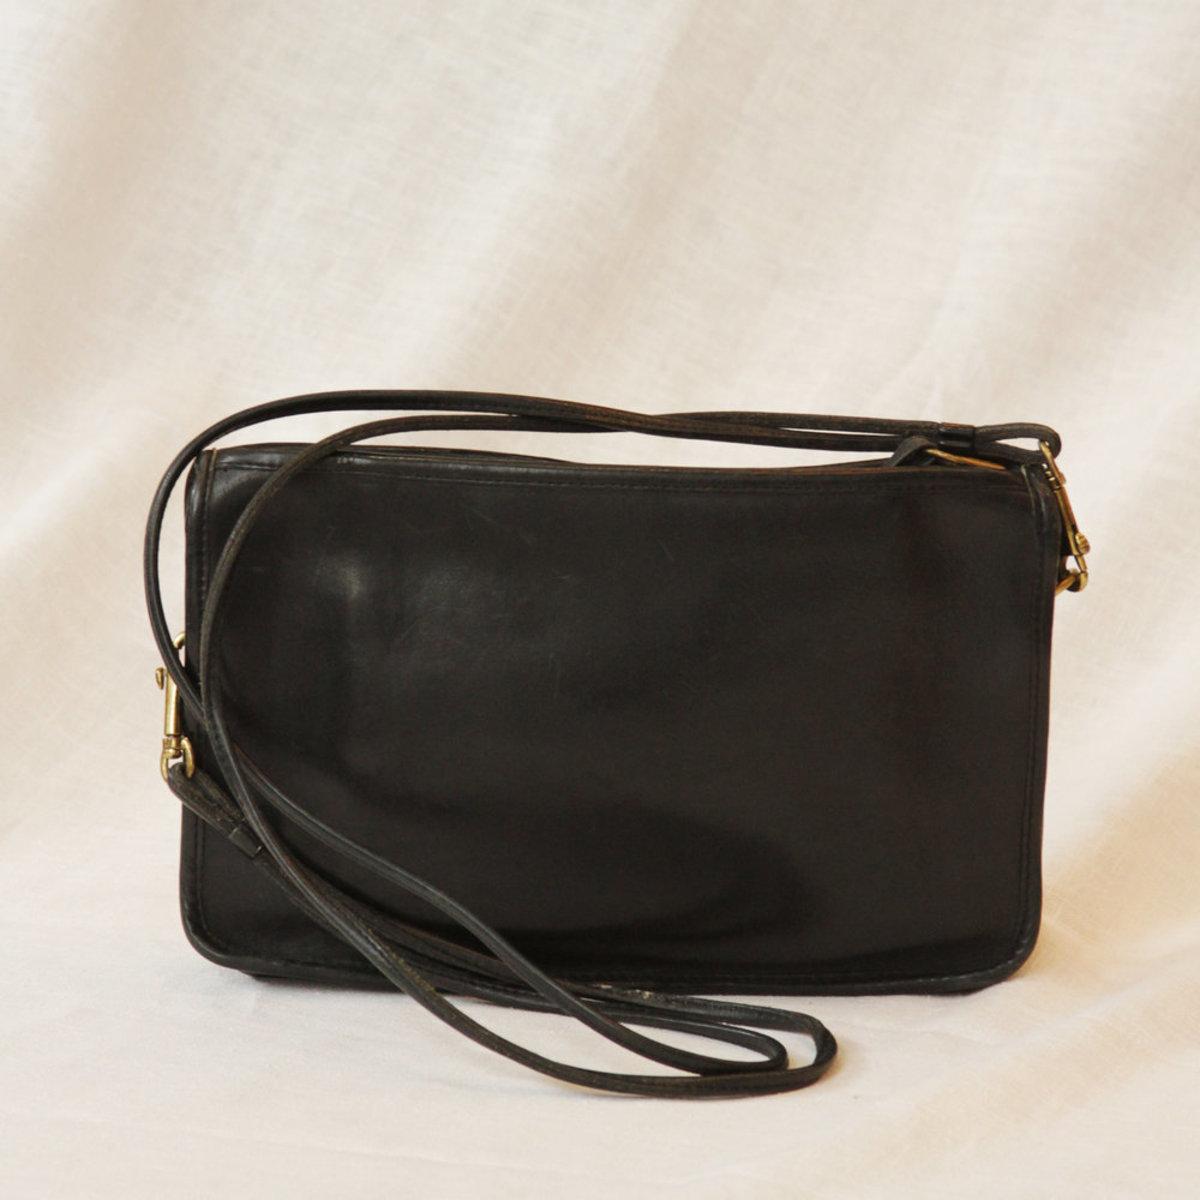 ff873ea03 Vintage Coach Bag - Black | Garmentory